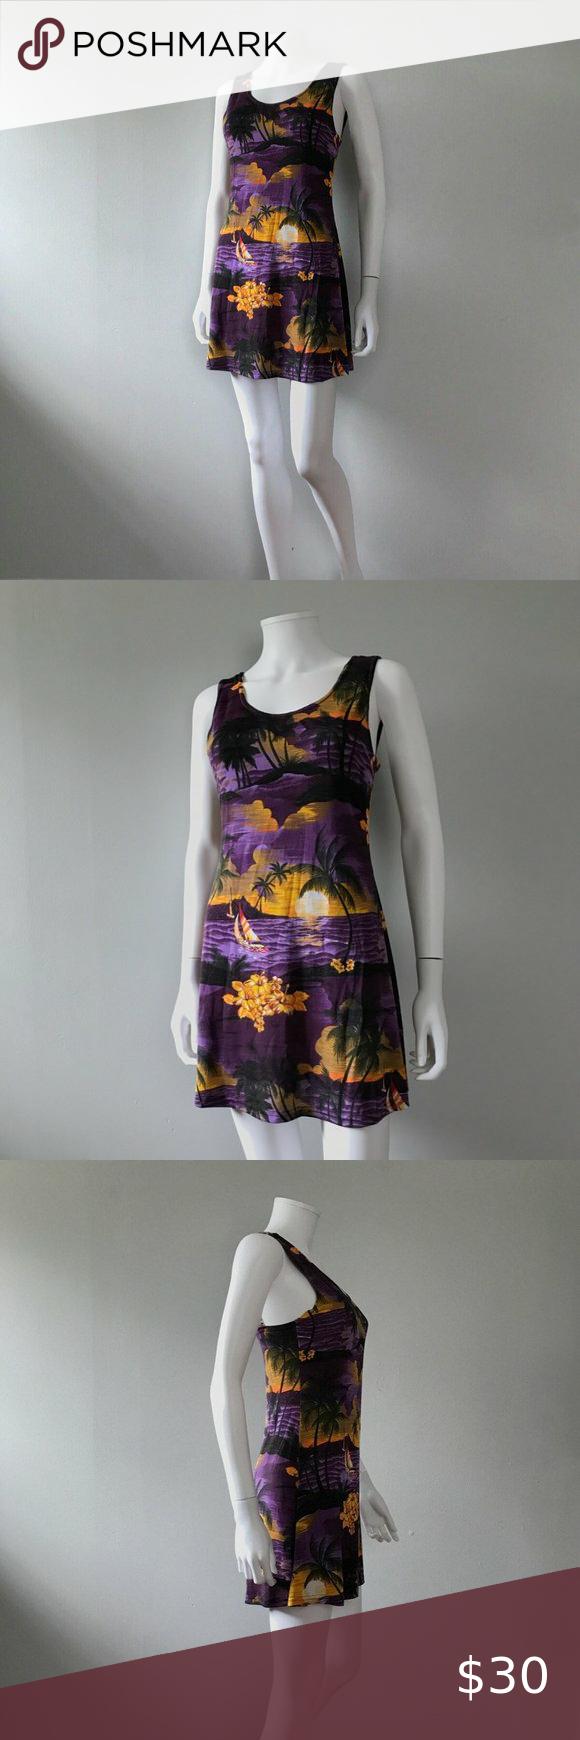 Vintage 90s Mini Dress Hawaiian Tropical Sunset In 2020 Clothes Design Printed Mini Dress Vintage Dresses